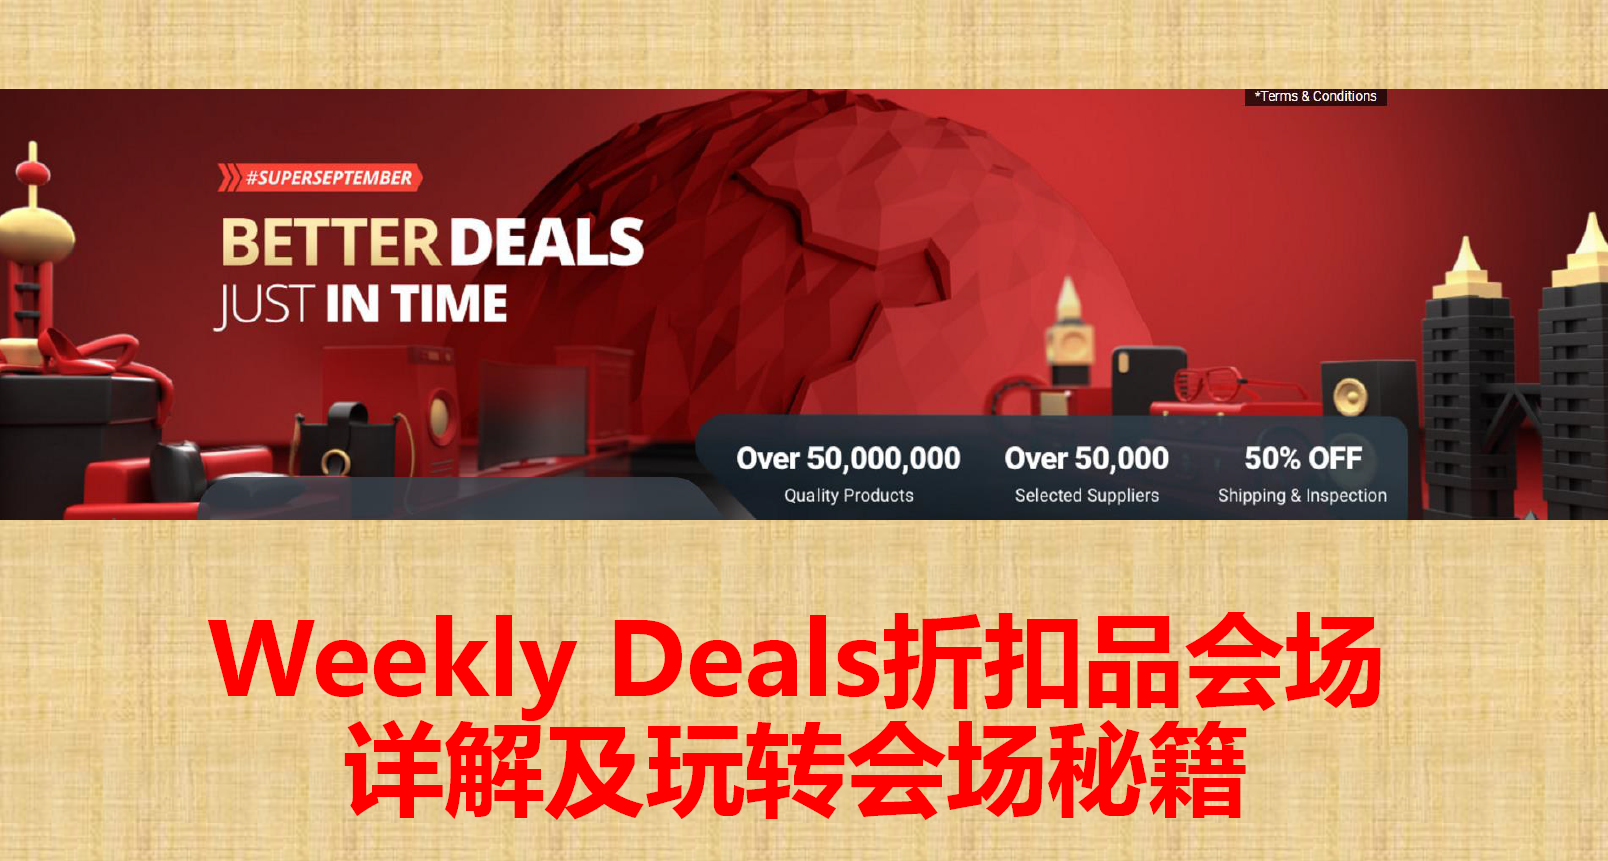 Weekly Deals折扣品会场详解及玩法